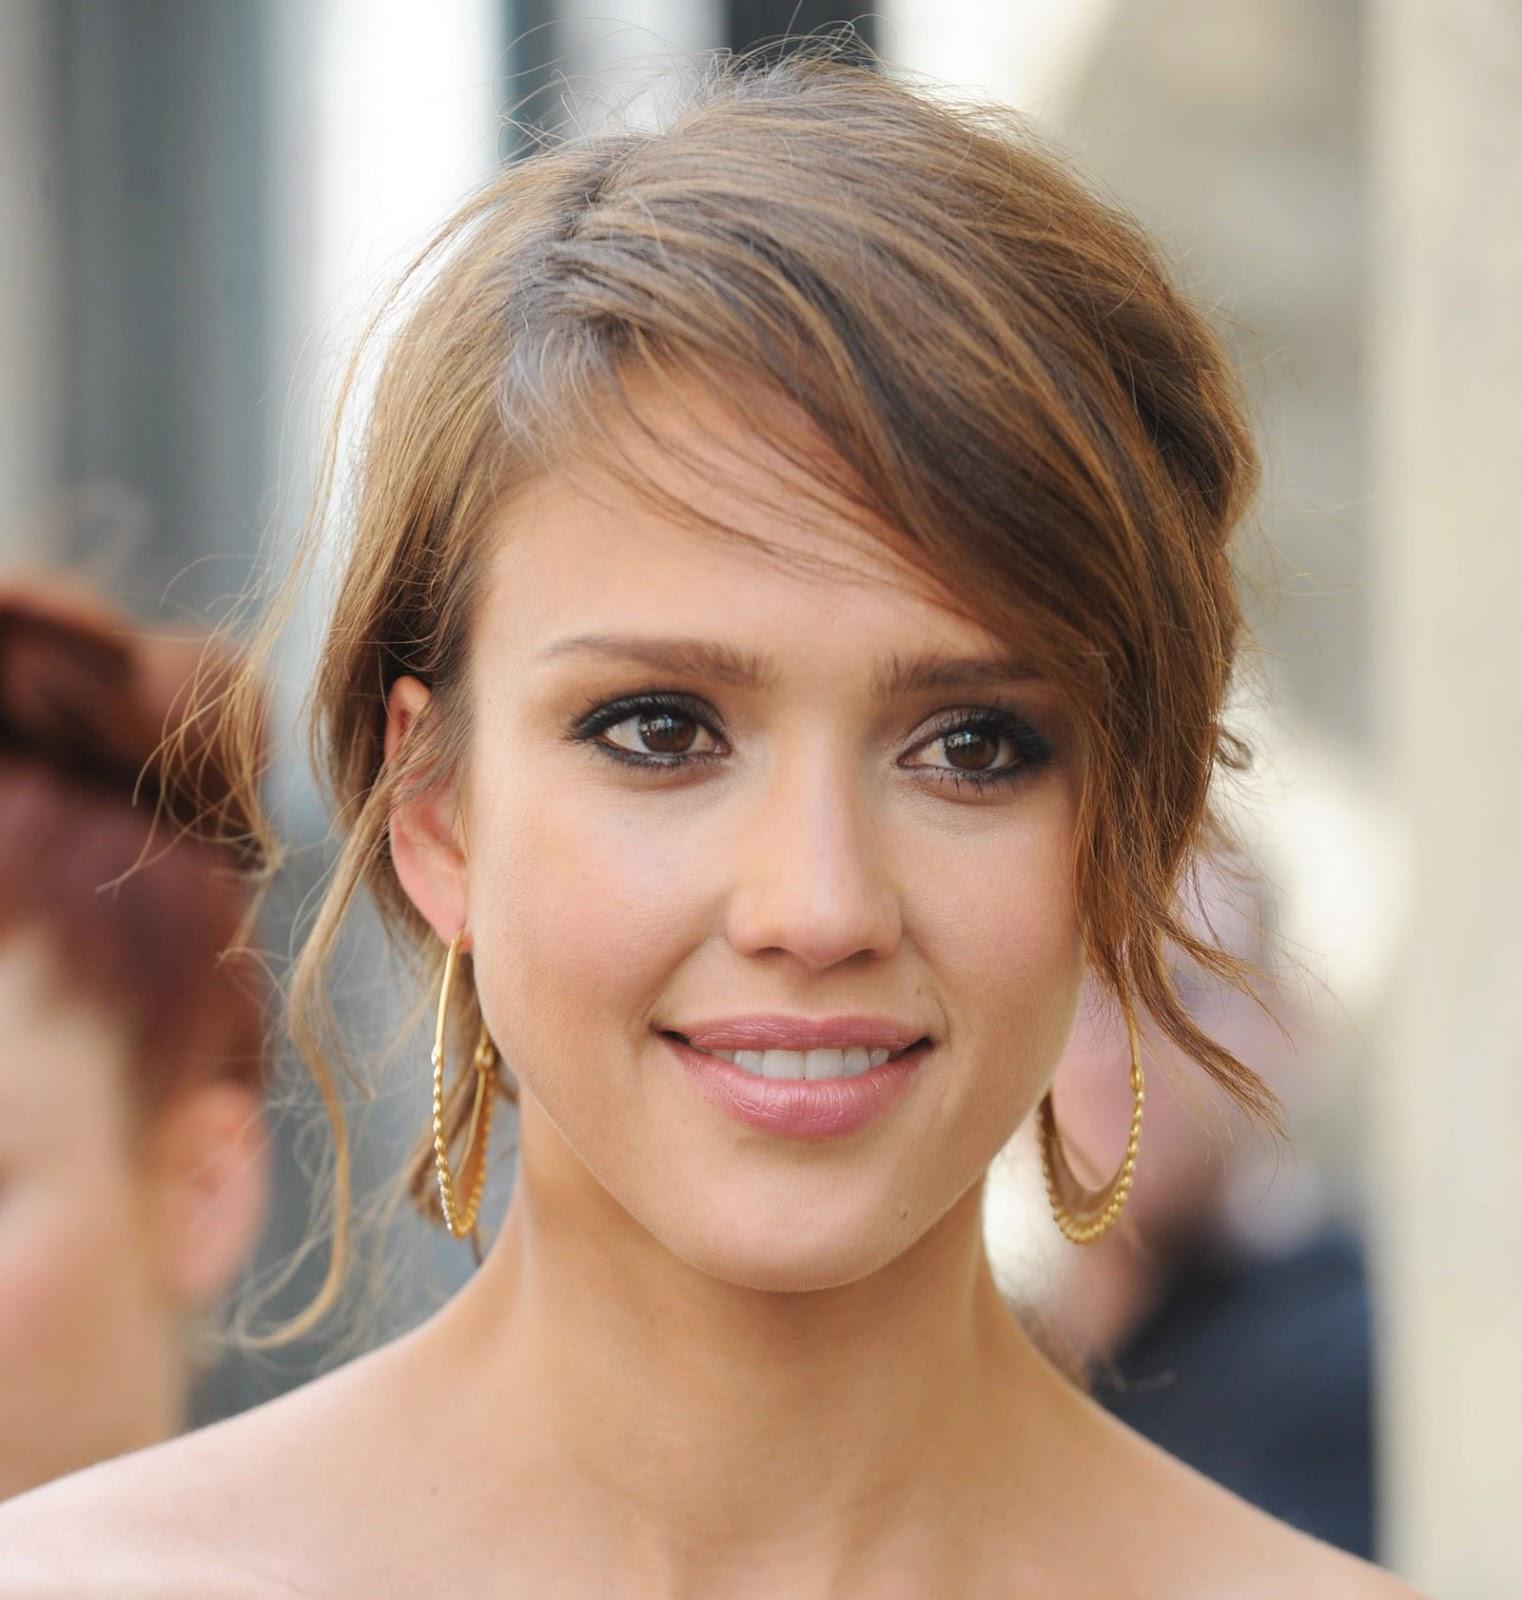 Jessica alba short hairstyles 2013